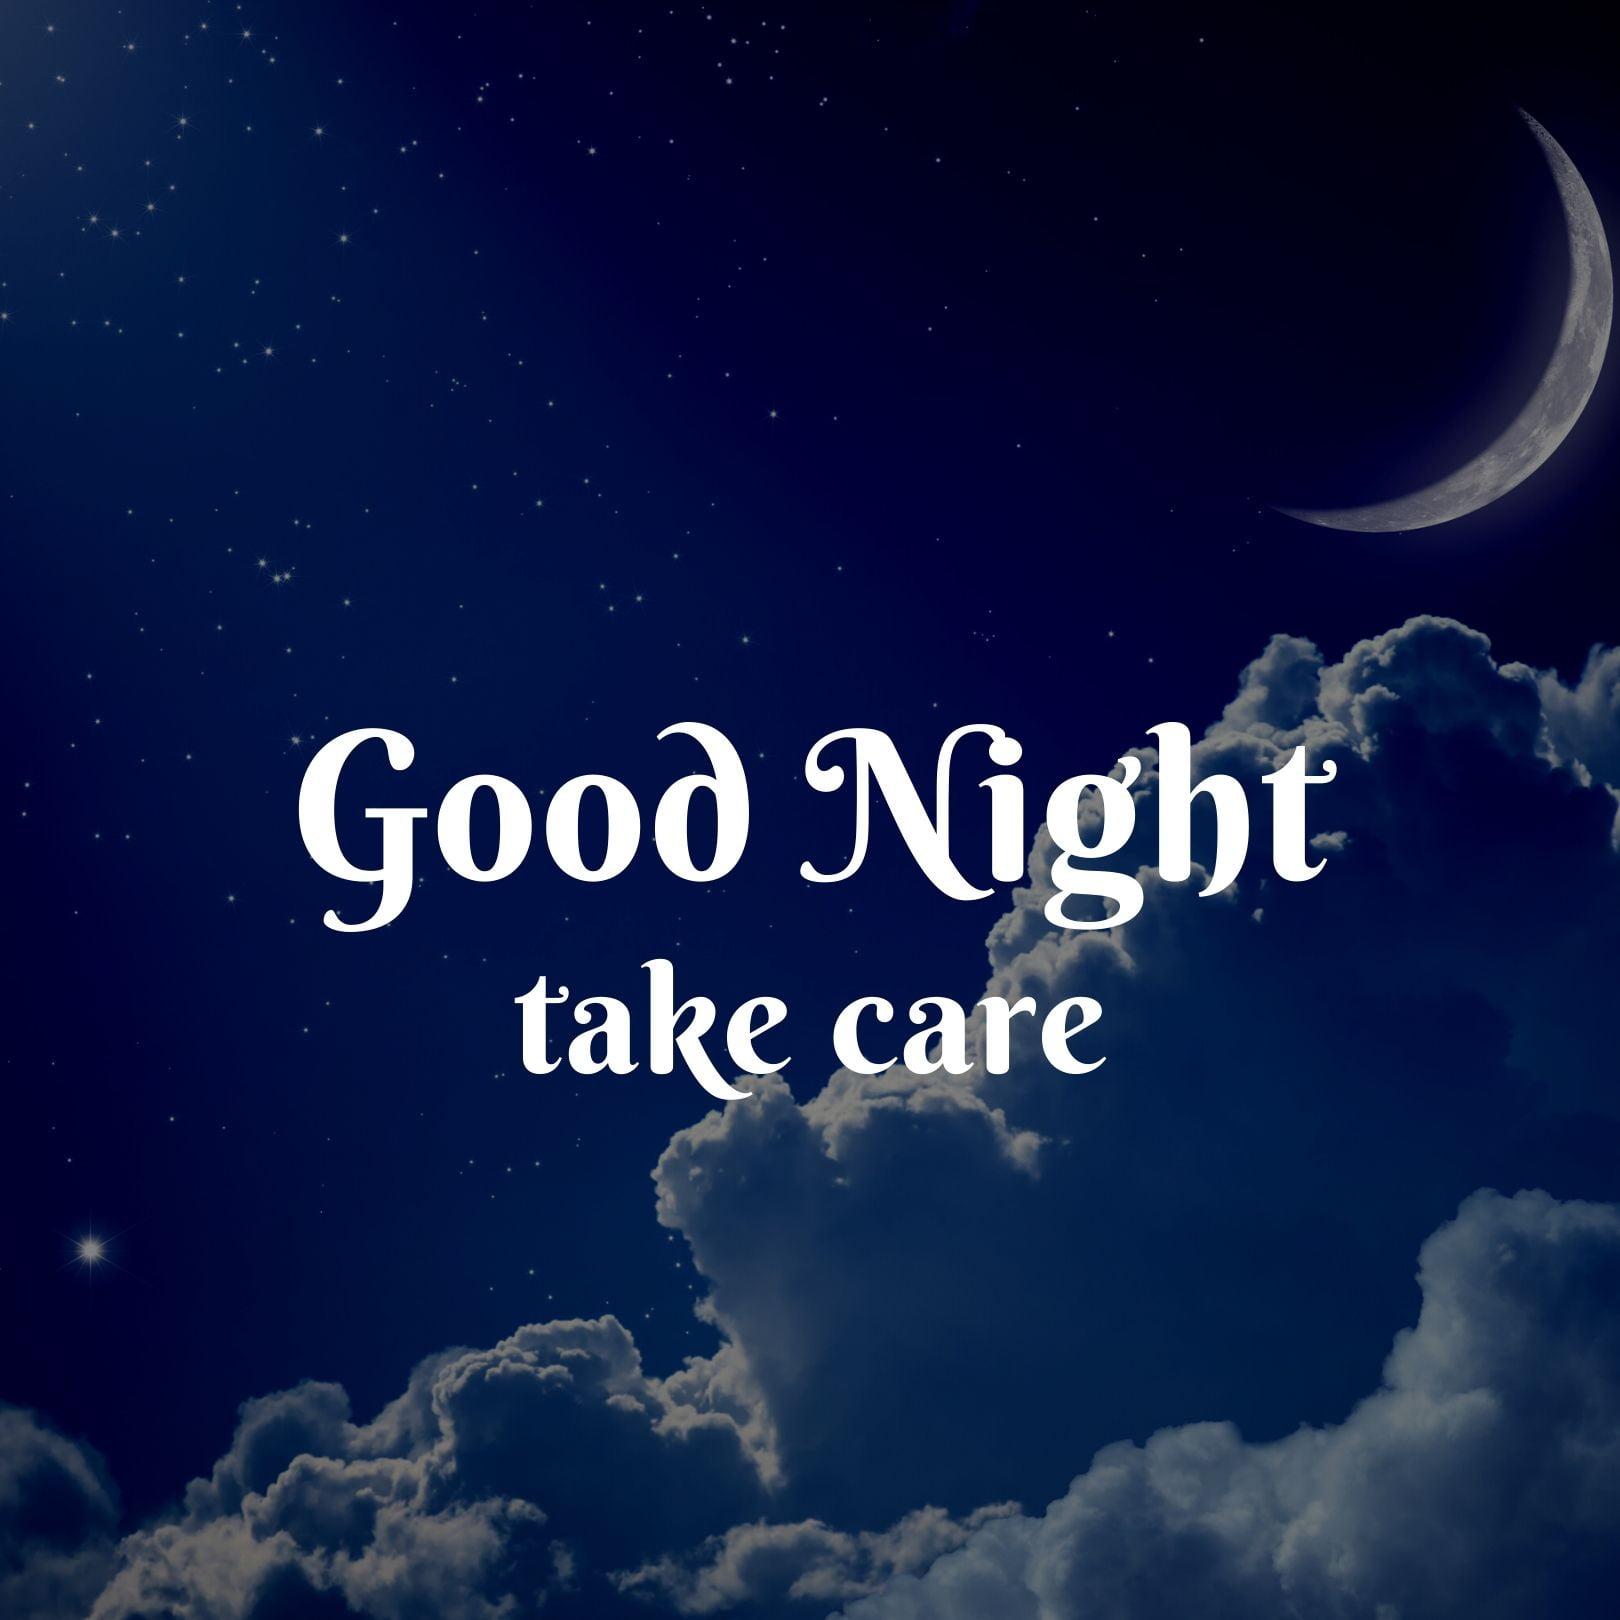 Good Night take care pic full HD free download.